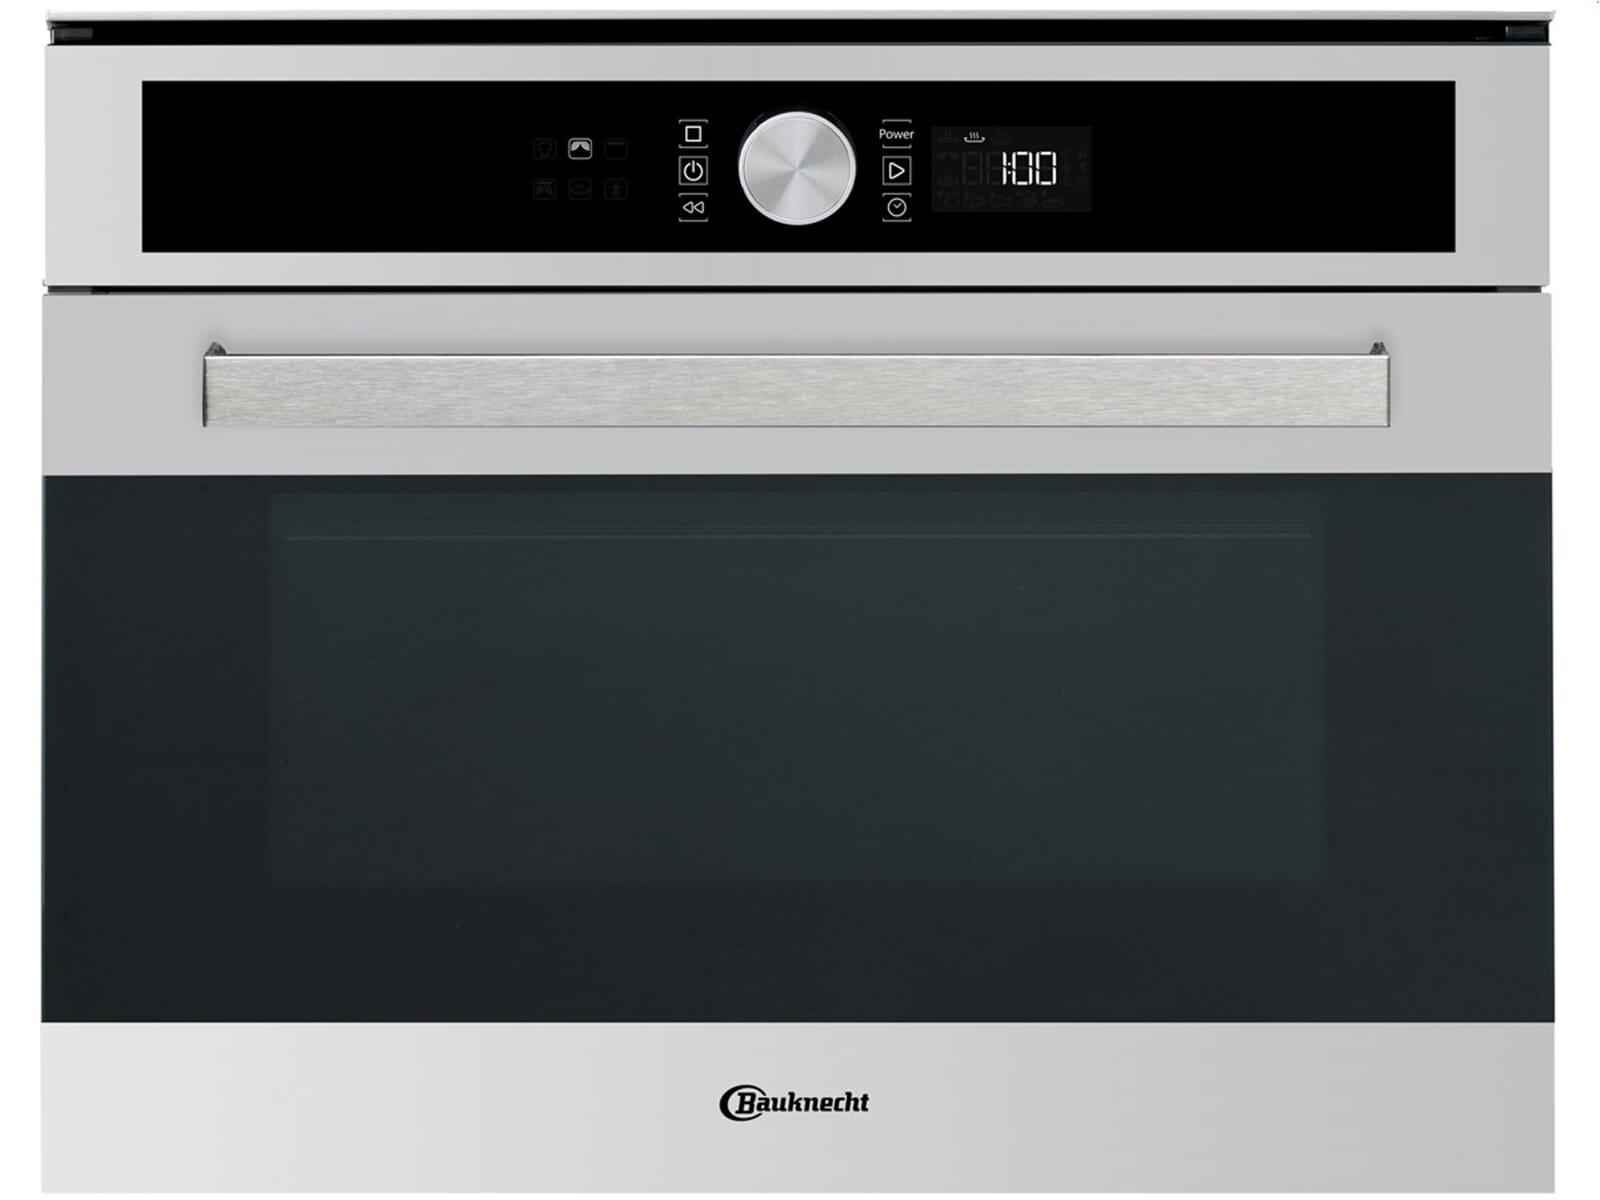 Produktabbildung Bauknecht EMPK5 5645 PT Einbau-Mikrowelle Edelstahl